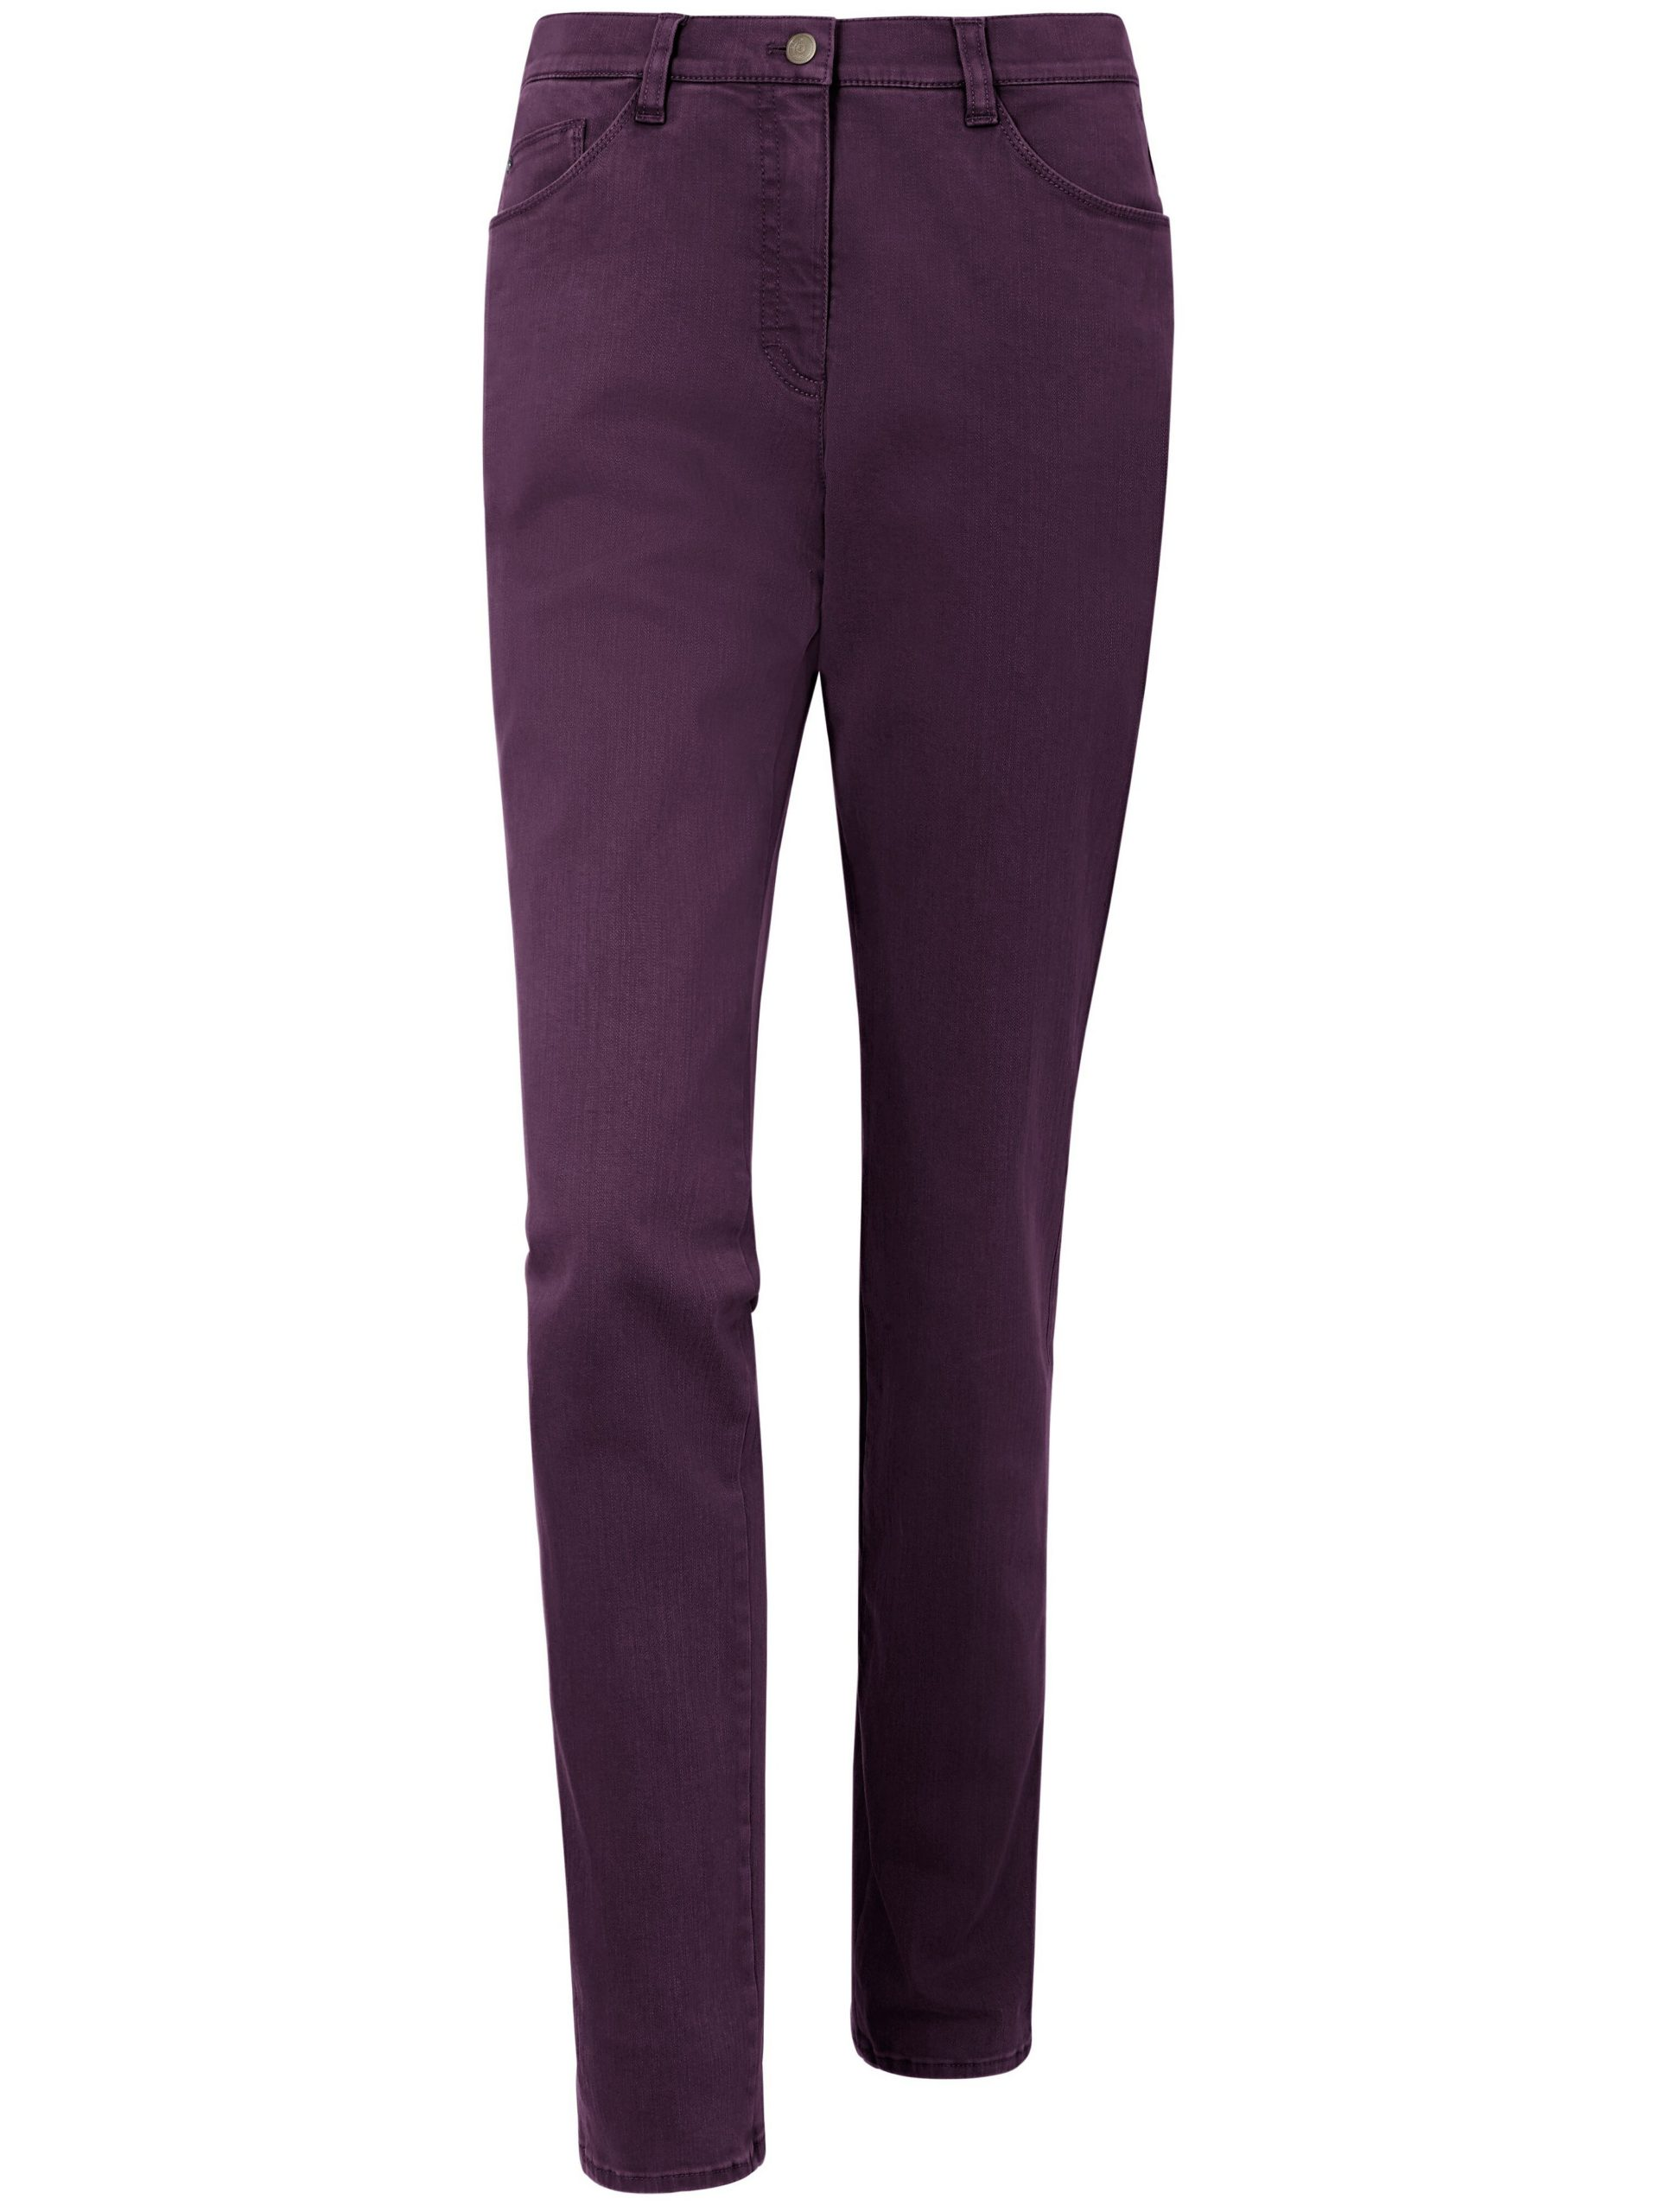 Jeans, model Mary Van Brax Feel Good paars Kopen